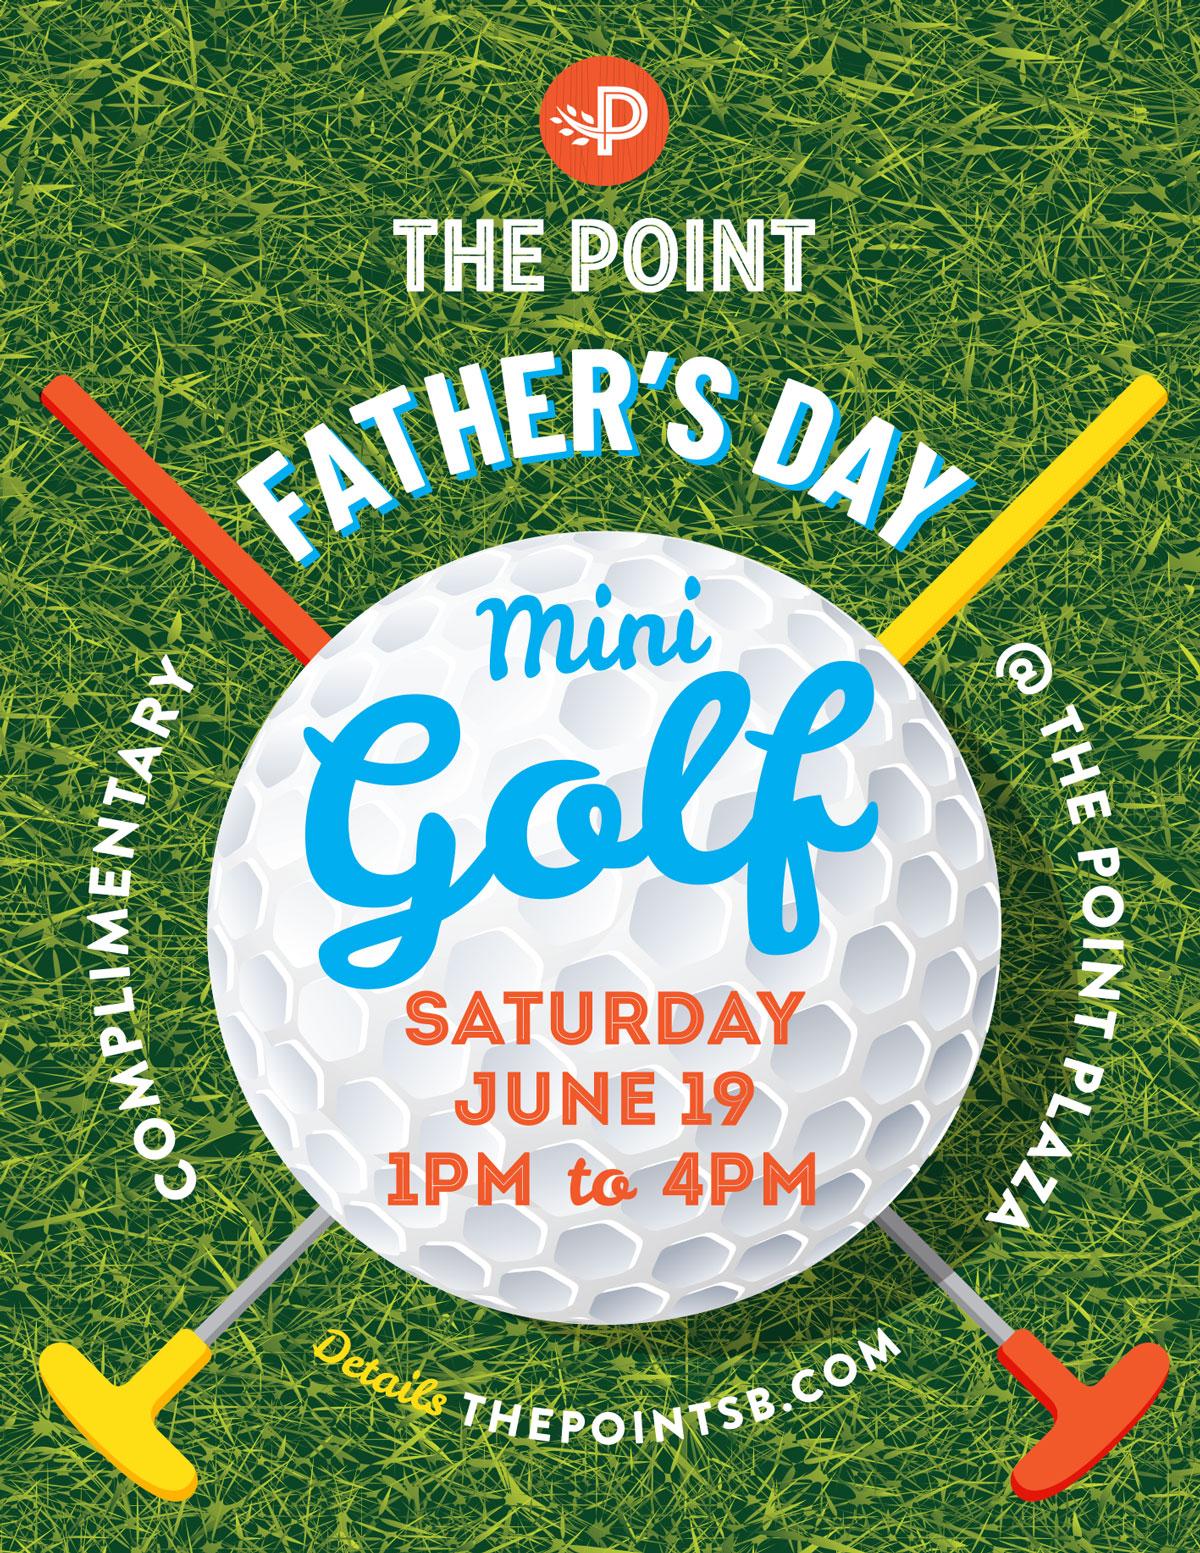 Father's Day Mini Golf event at The Point in El Segundo